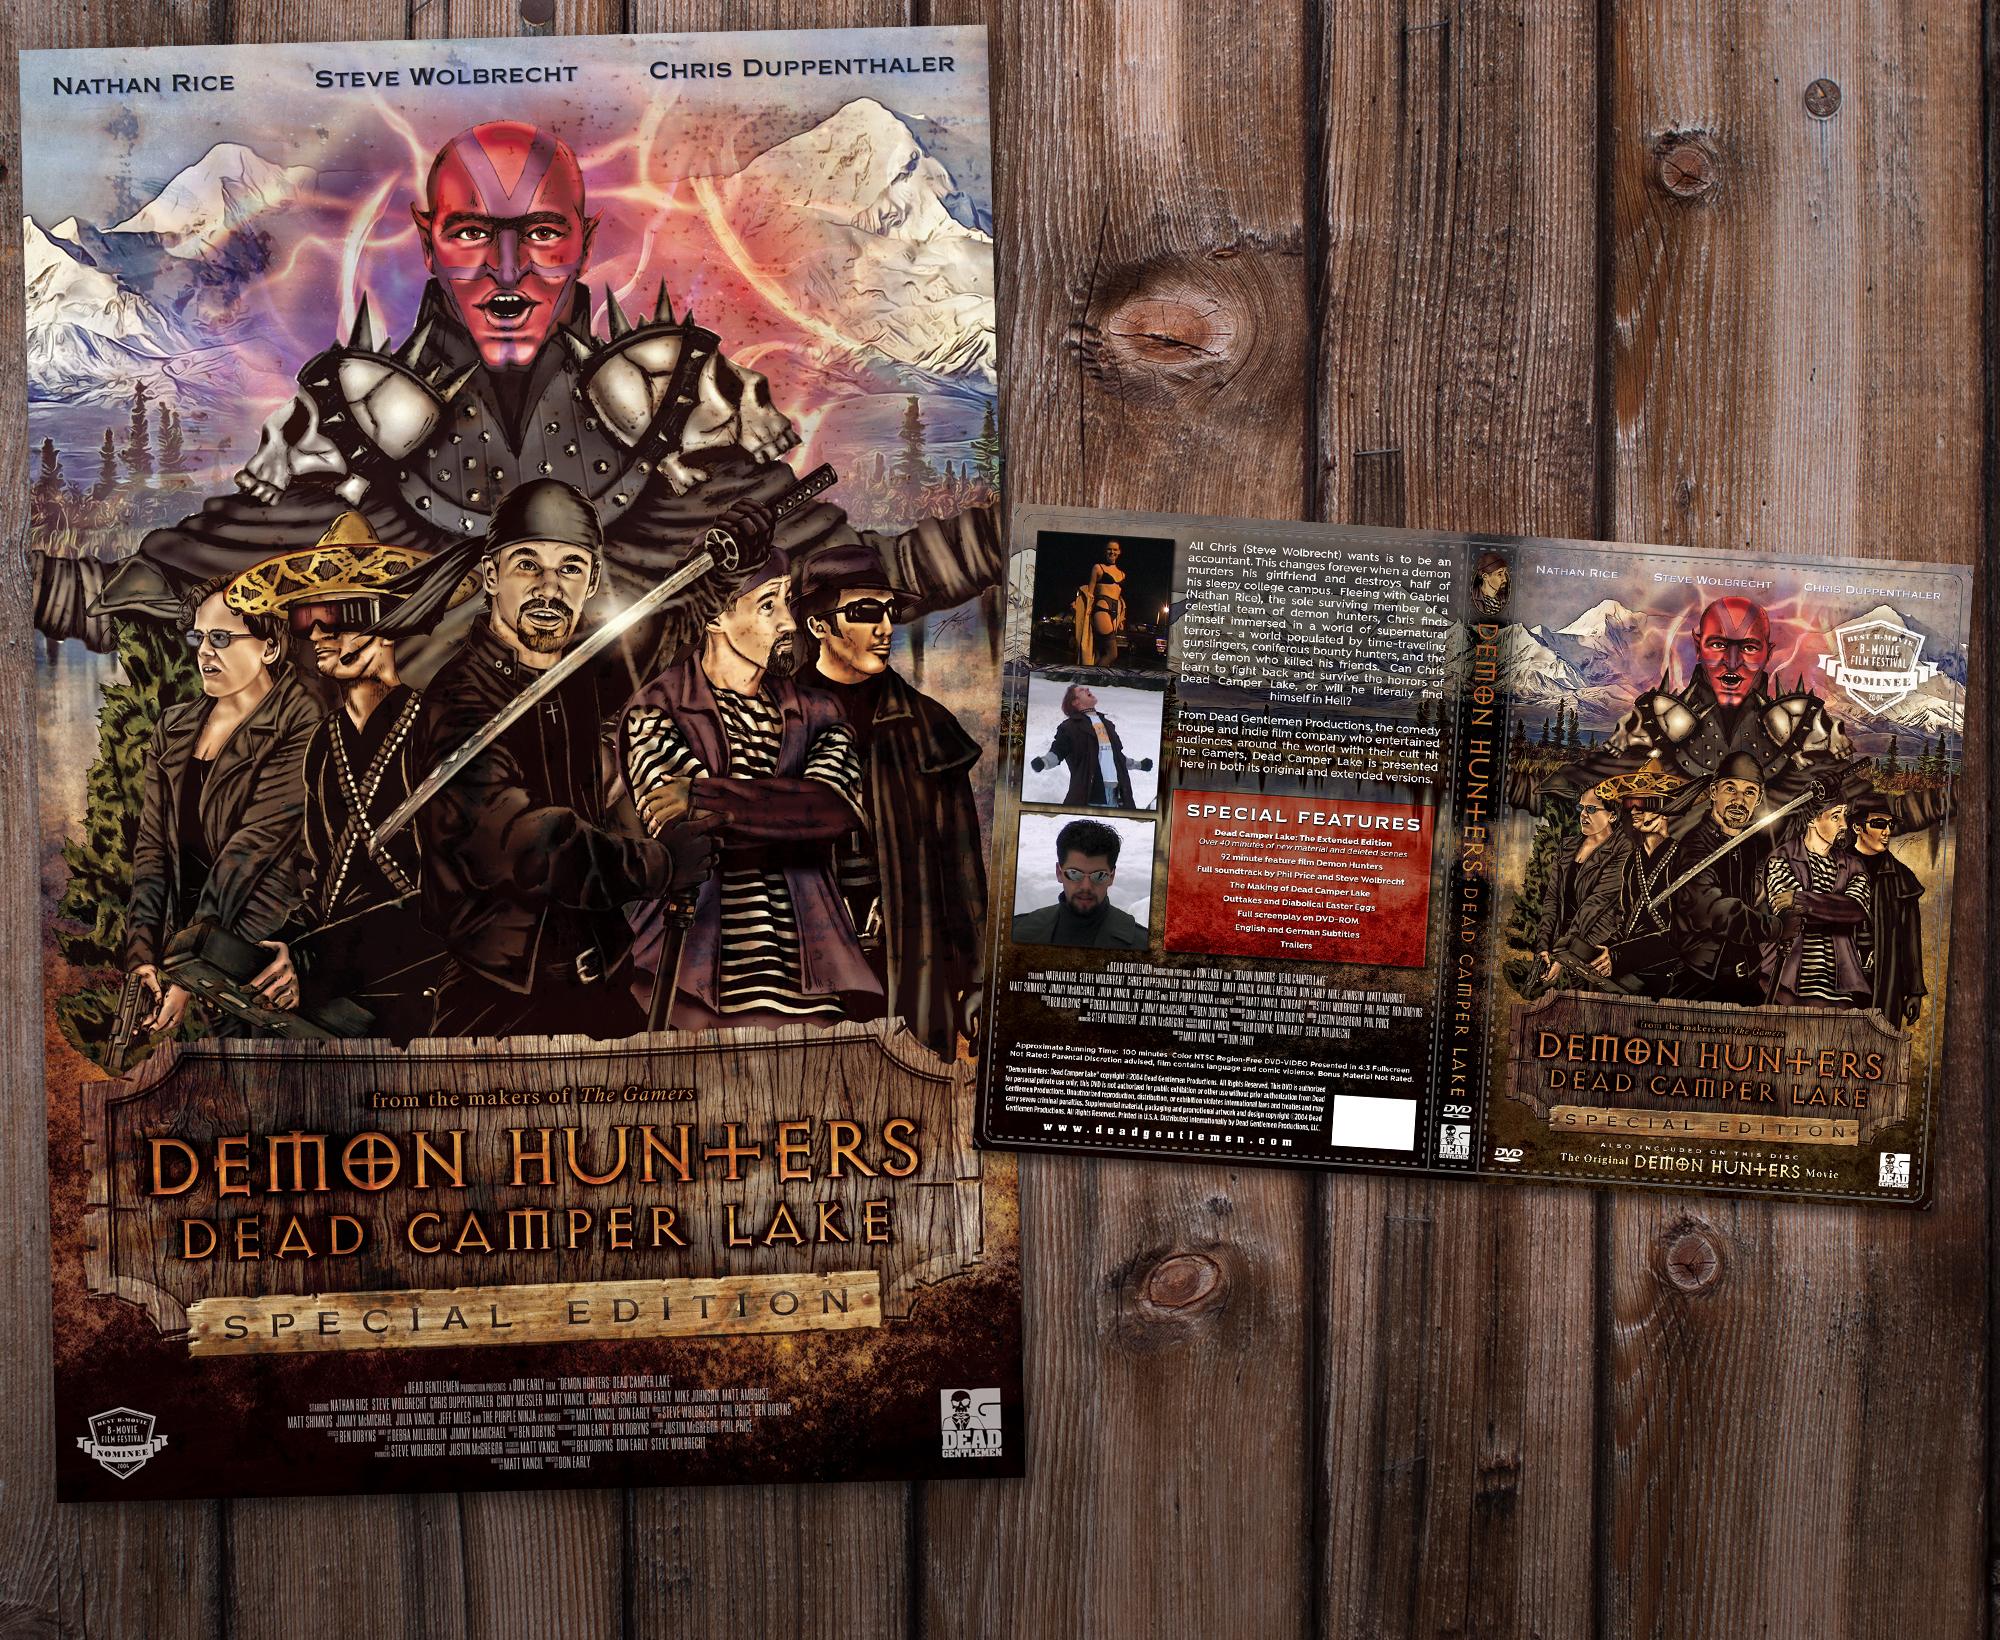 Demon Hunters: Dead Camper Lake Poster & DVD Cover